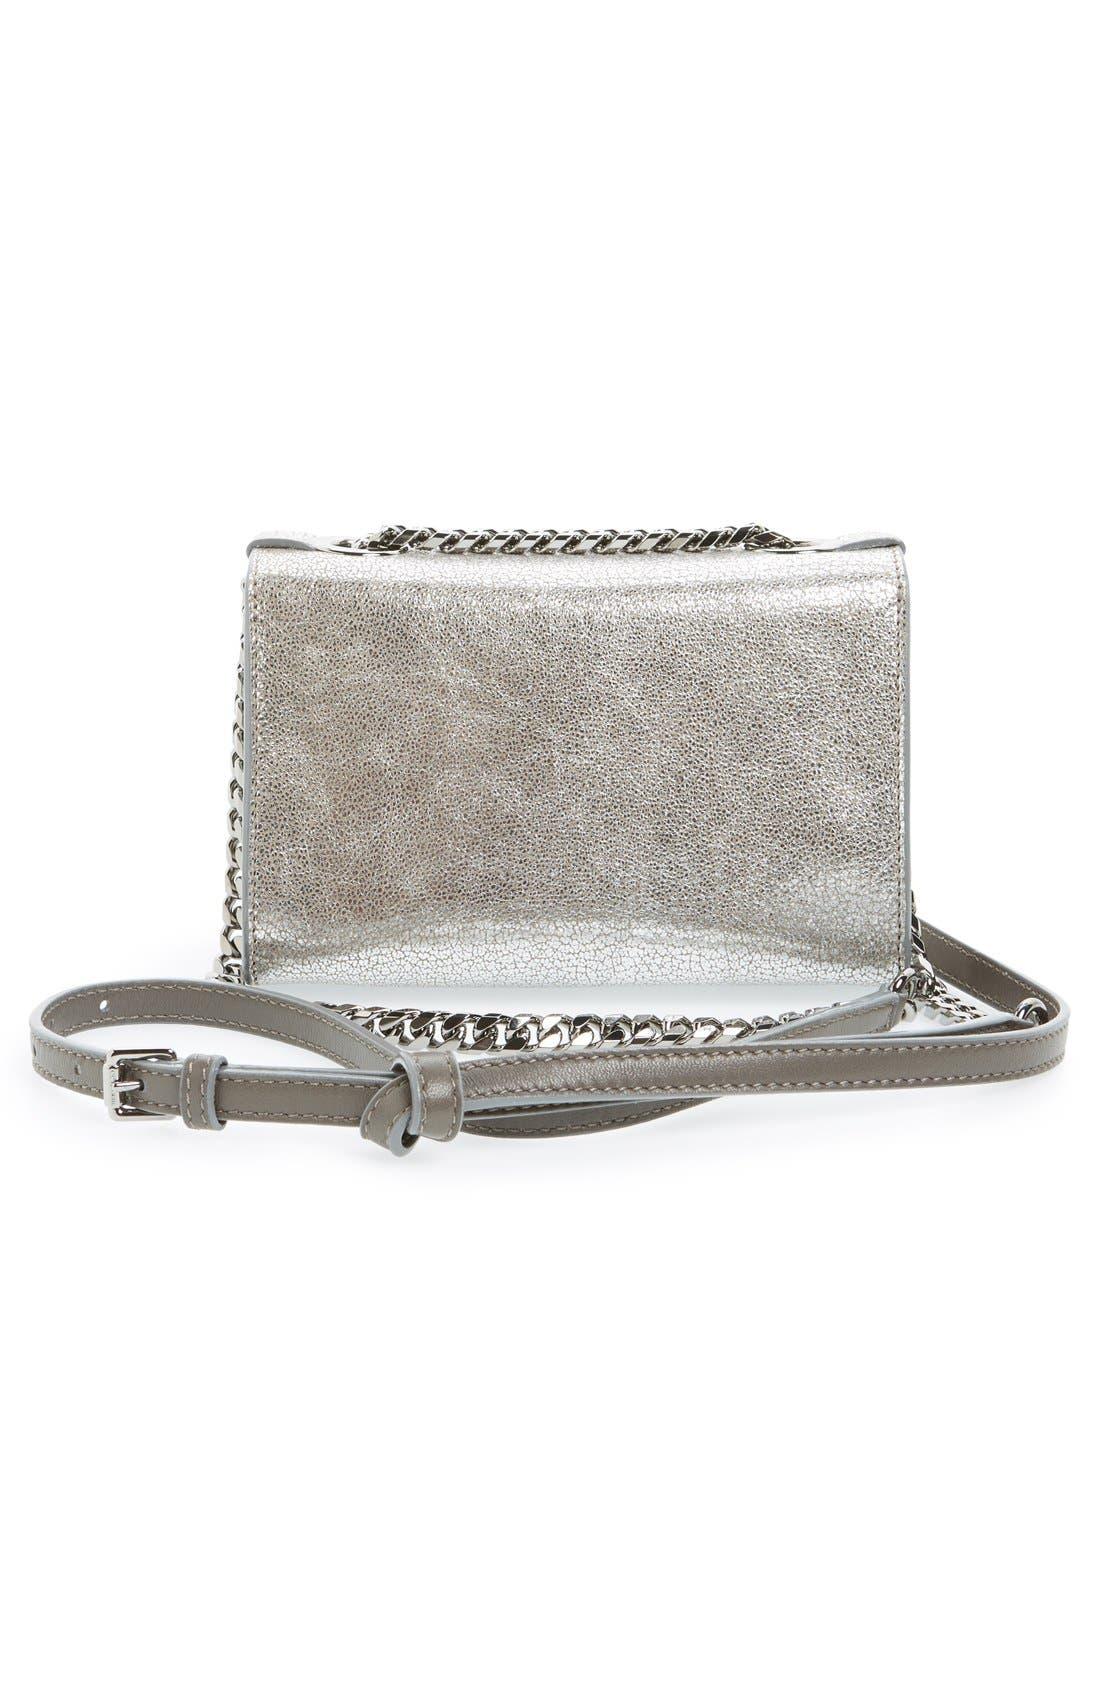 Alternate Image 3  - Jimmy Choo Rebel Mini Metallic Leather Crossbody Bag